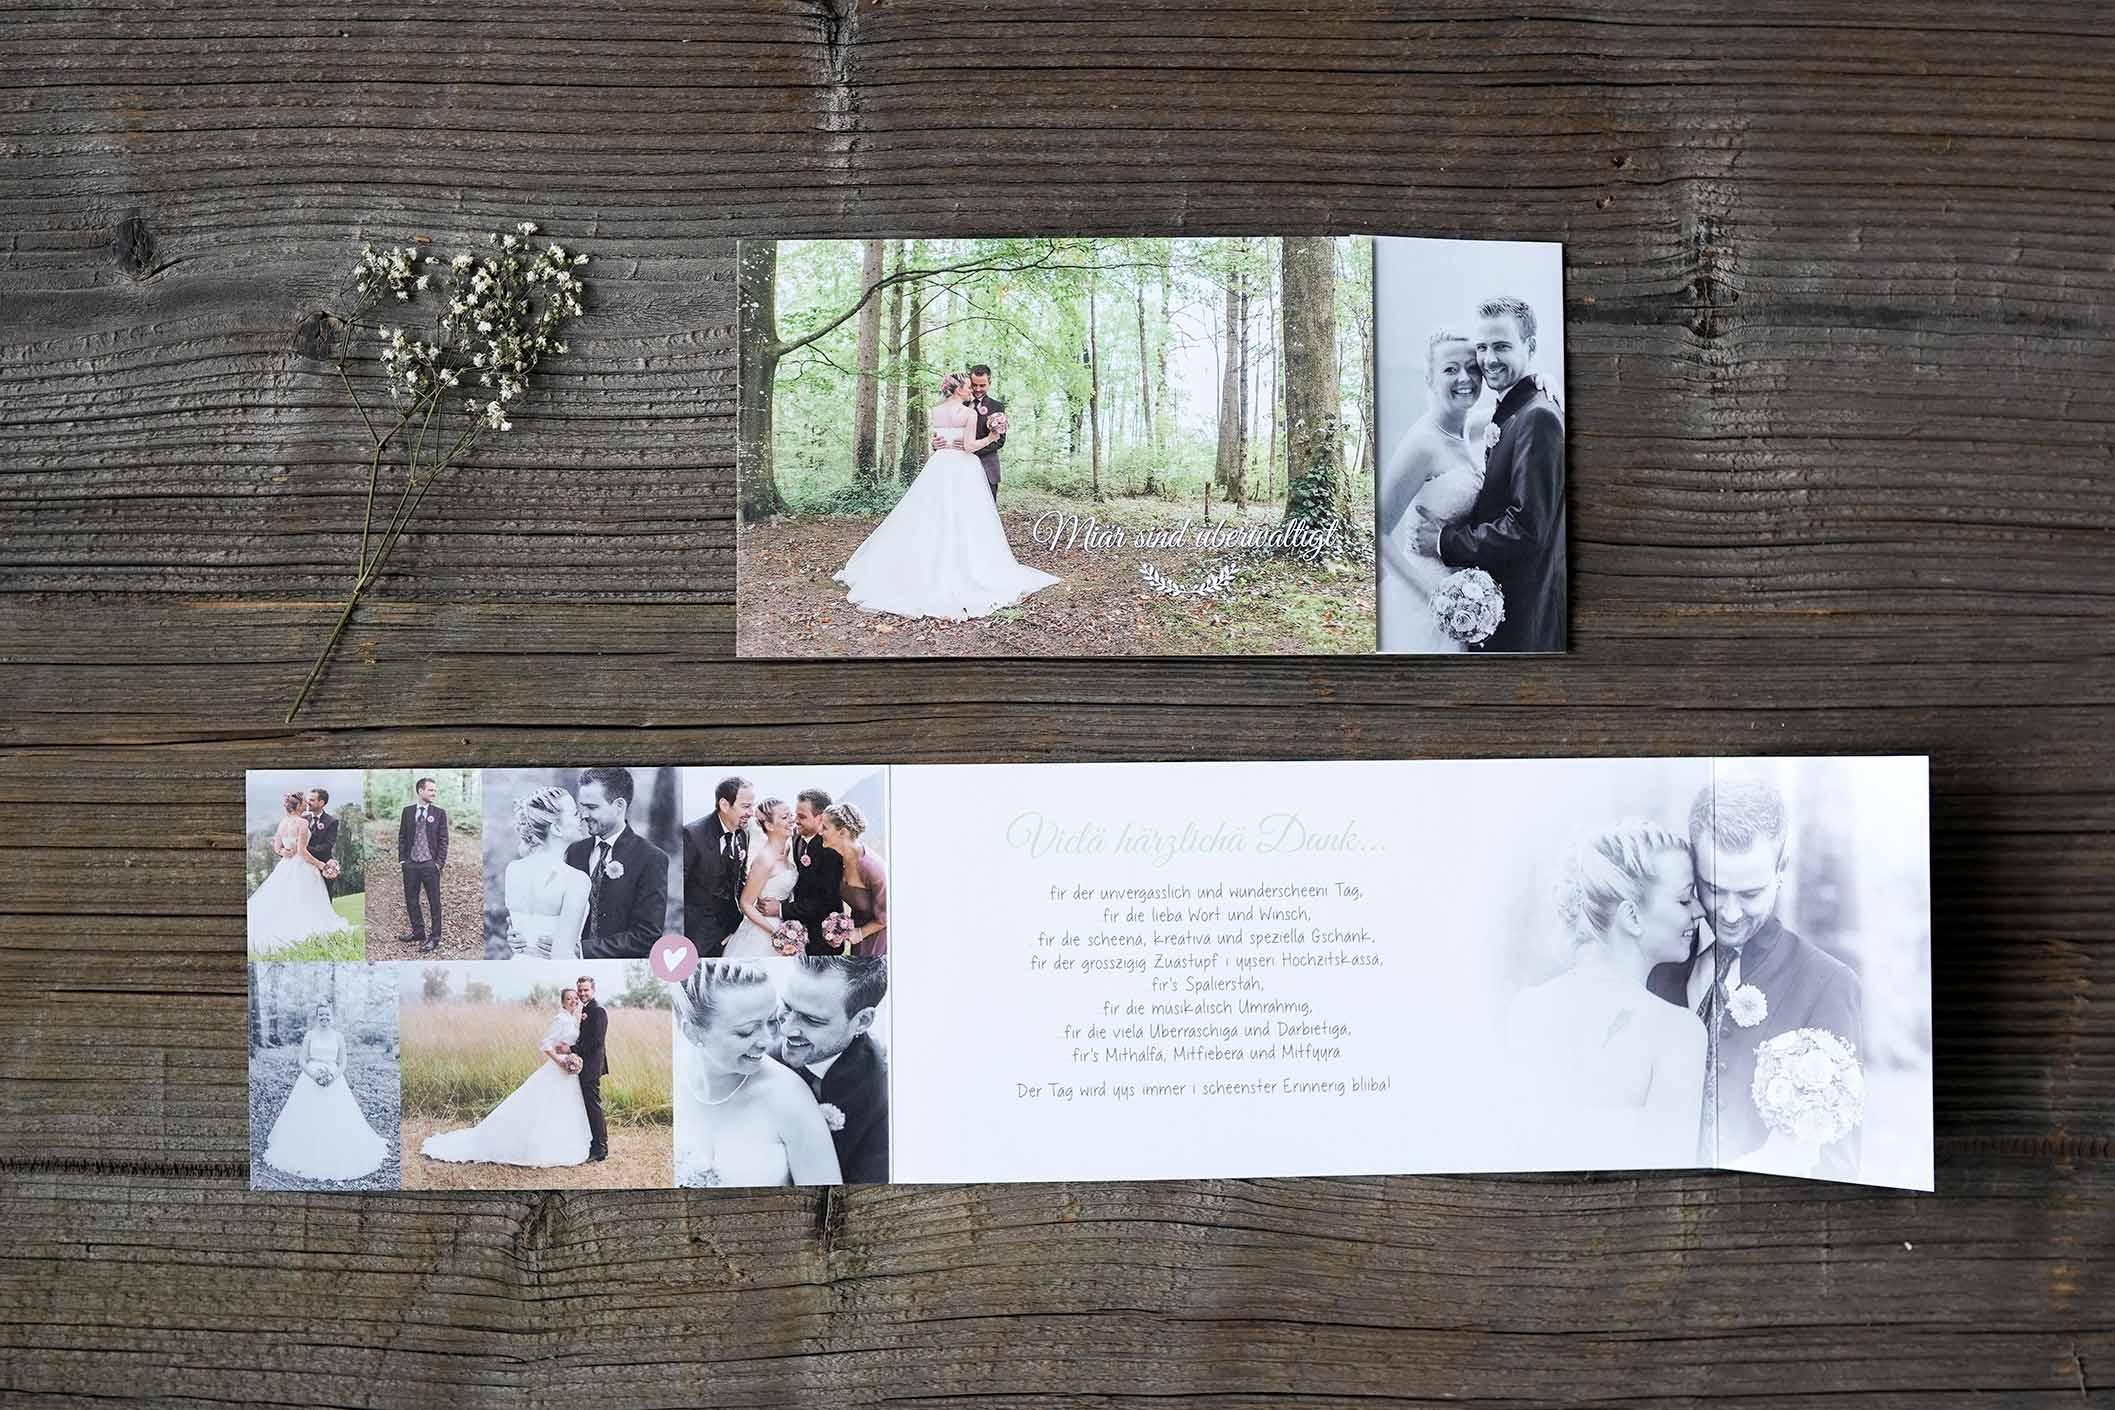 Hochzeitsdankeskarte Stadler